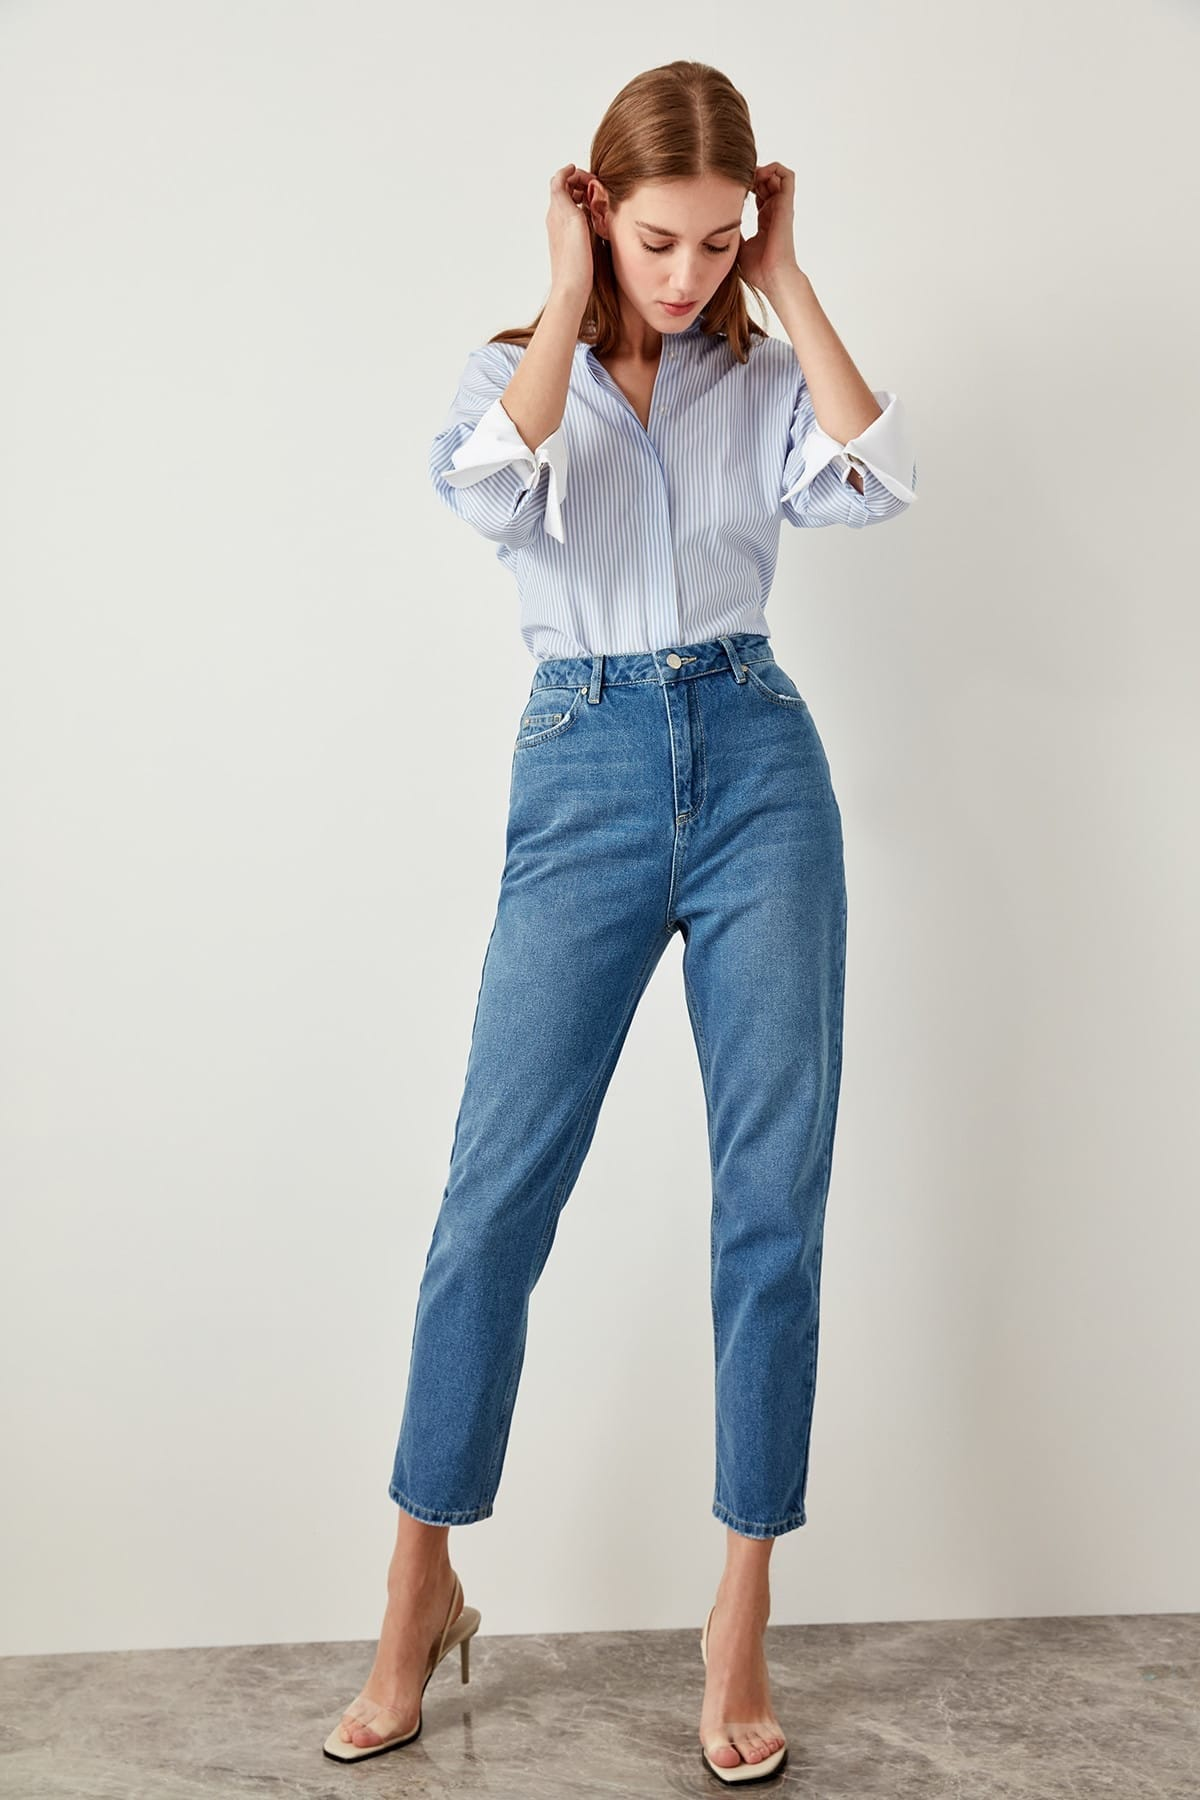 Trendyol azul cintura alta mãe 80s jeans casual reta-led denim para senhoras tclss19lr0047